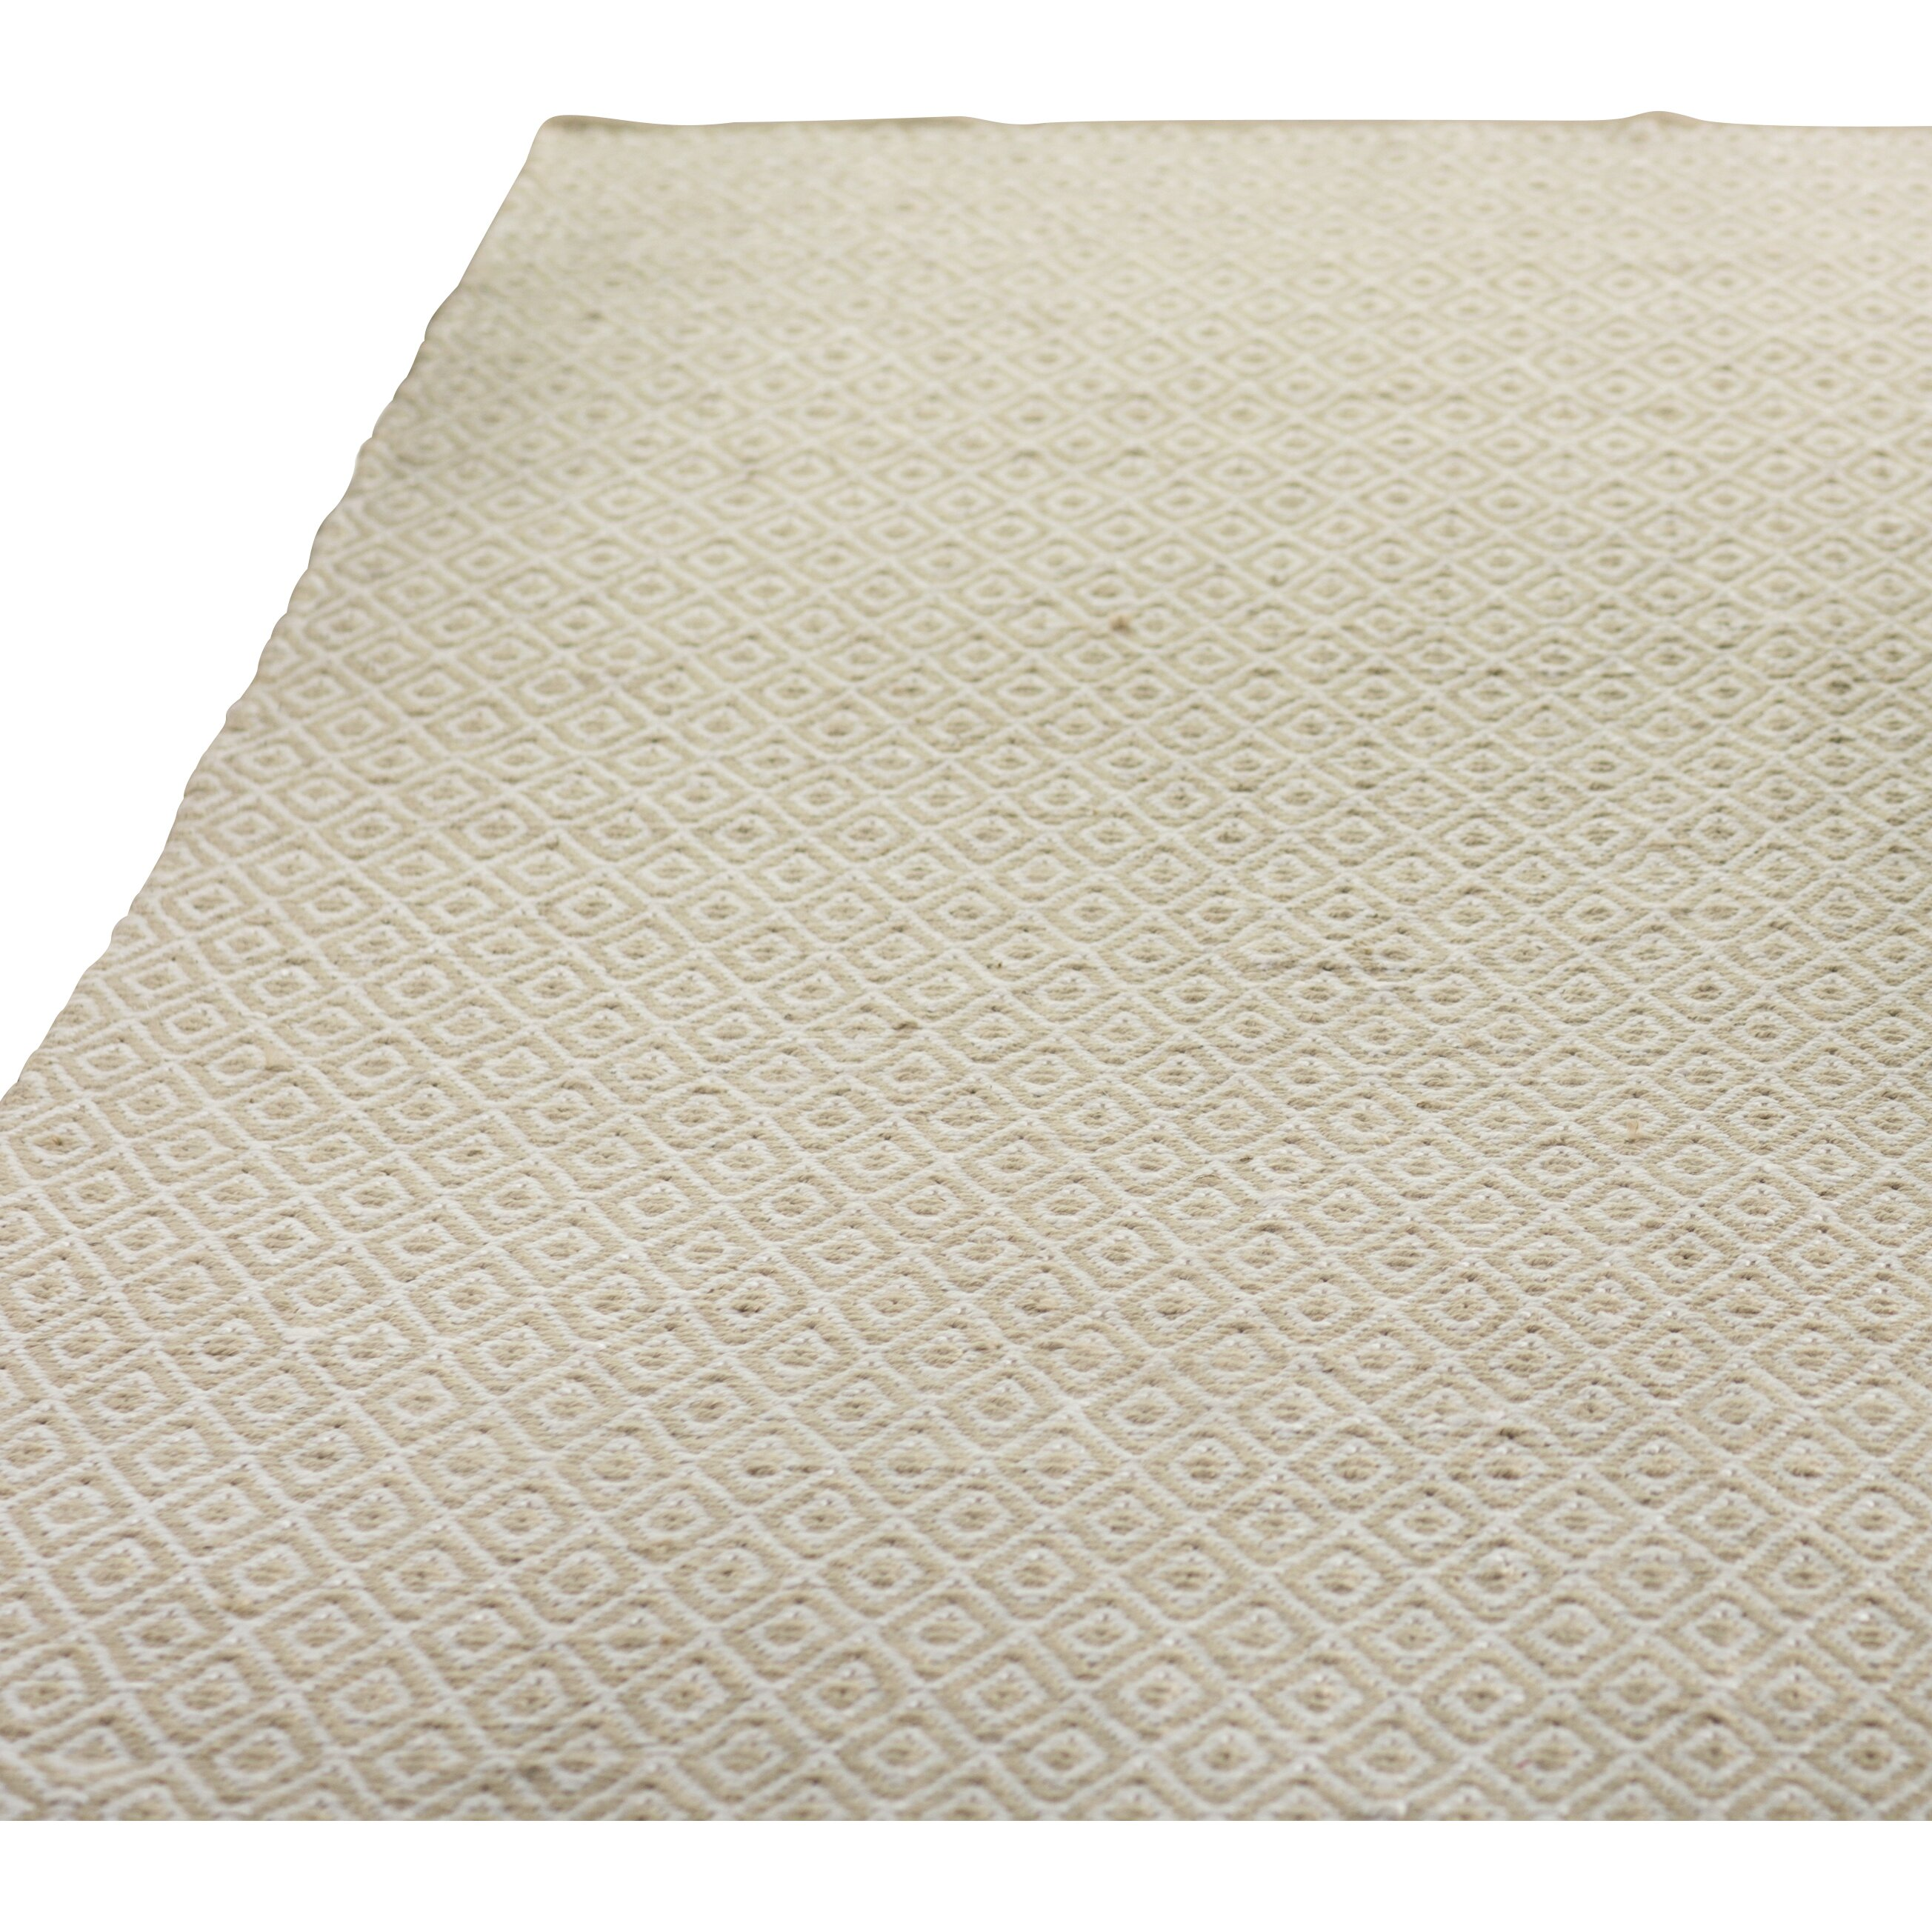 Blue Threshold Rugs Target 8 215 10 Source Carpet 8x10 Home Ed Area Ideas